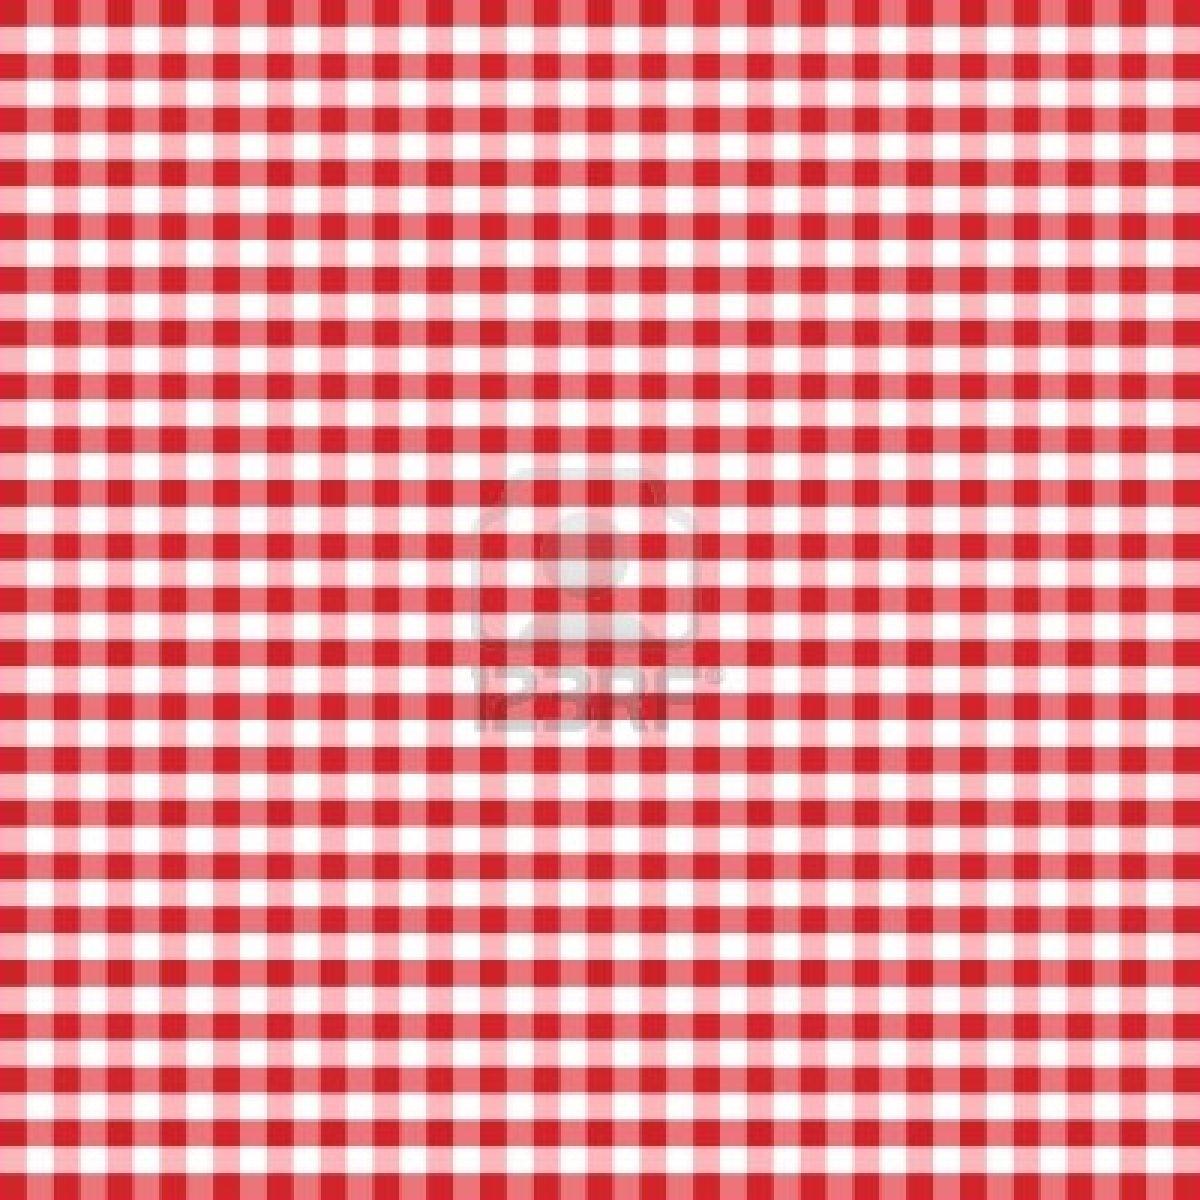 Plaid picnic tins Picnics, Latas y Cajas - espinterestcom